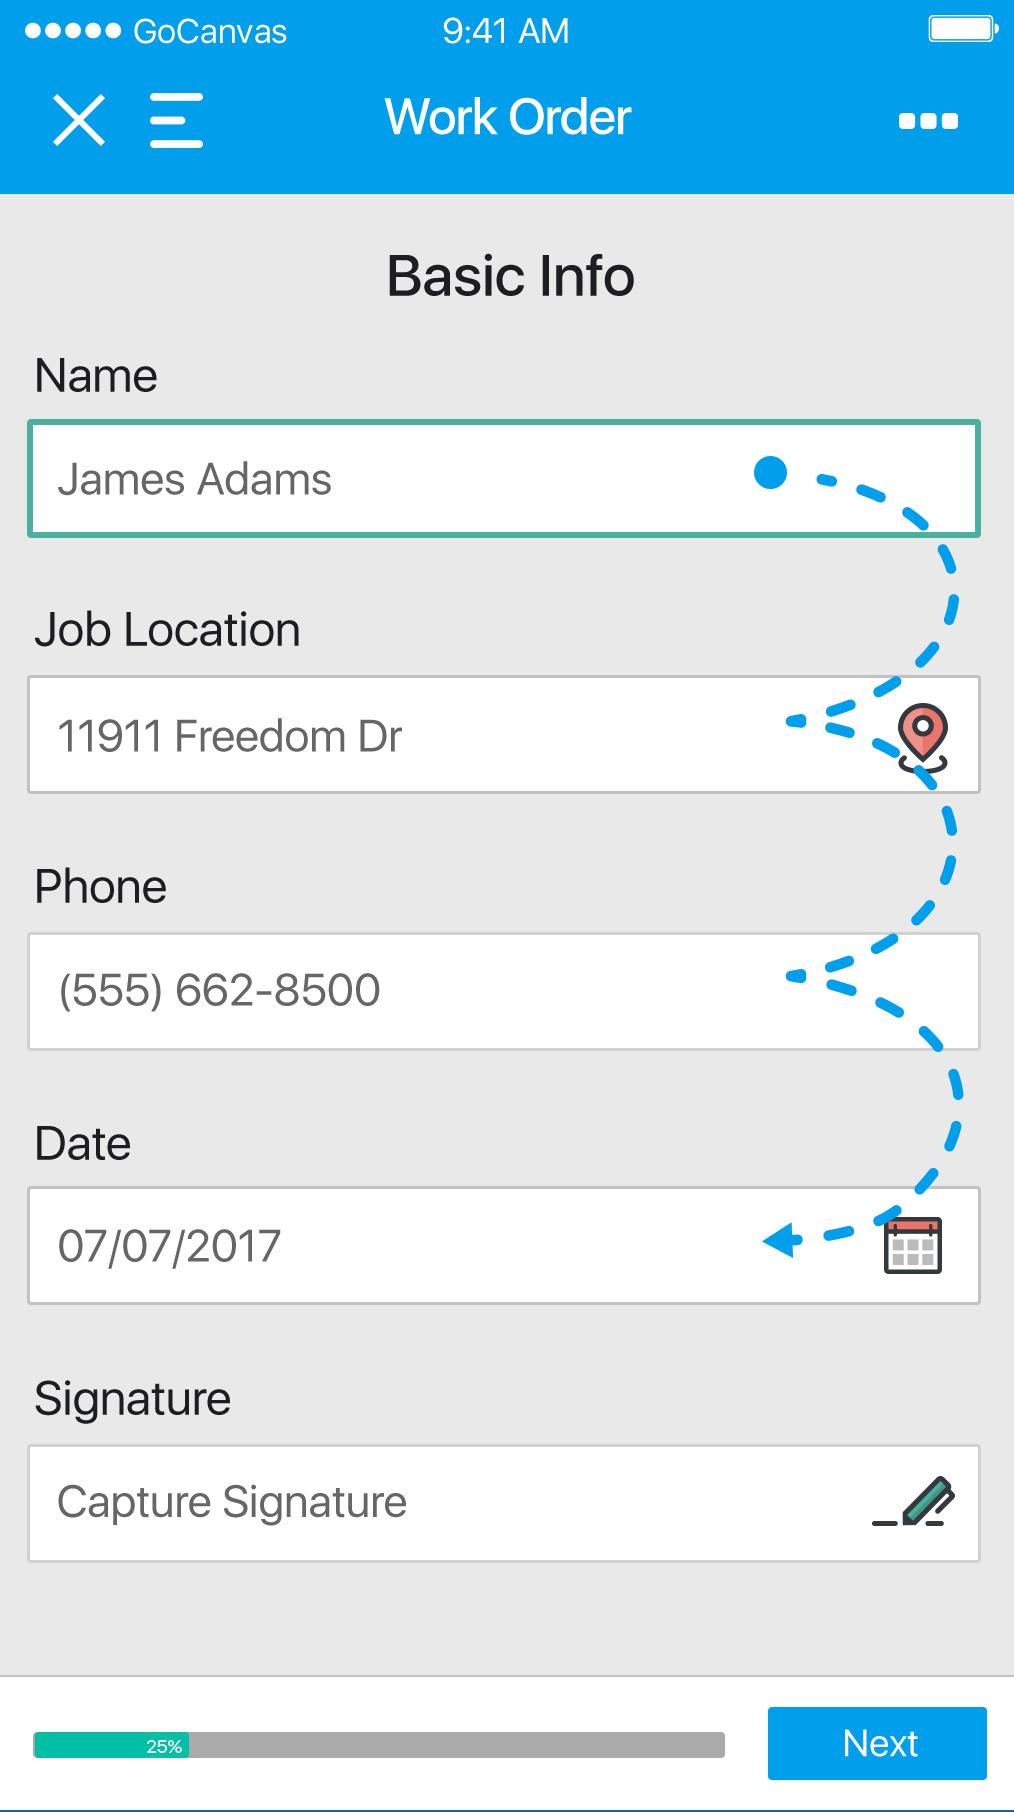 Work order basic information